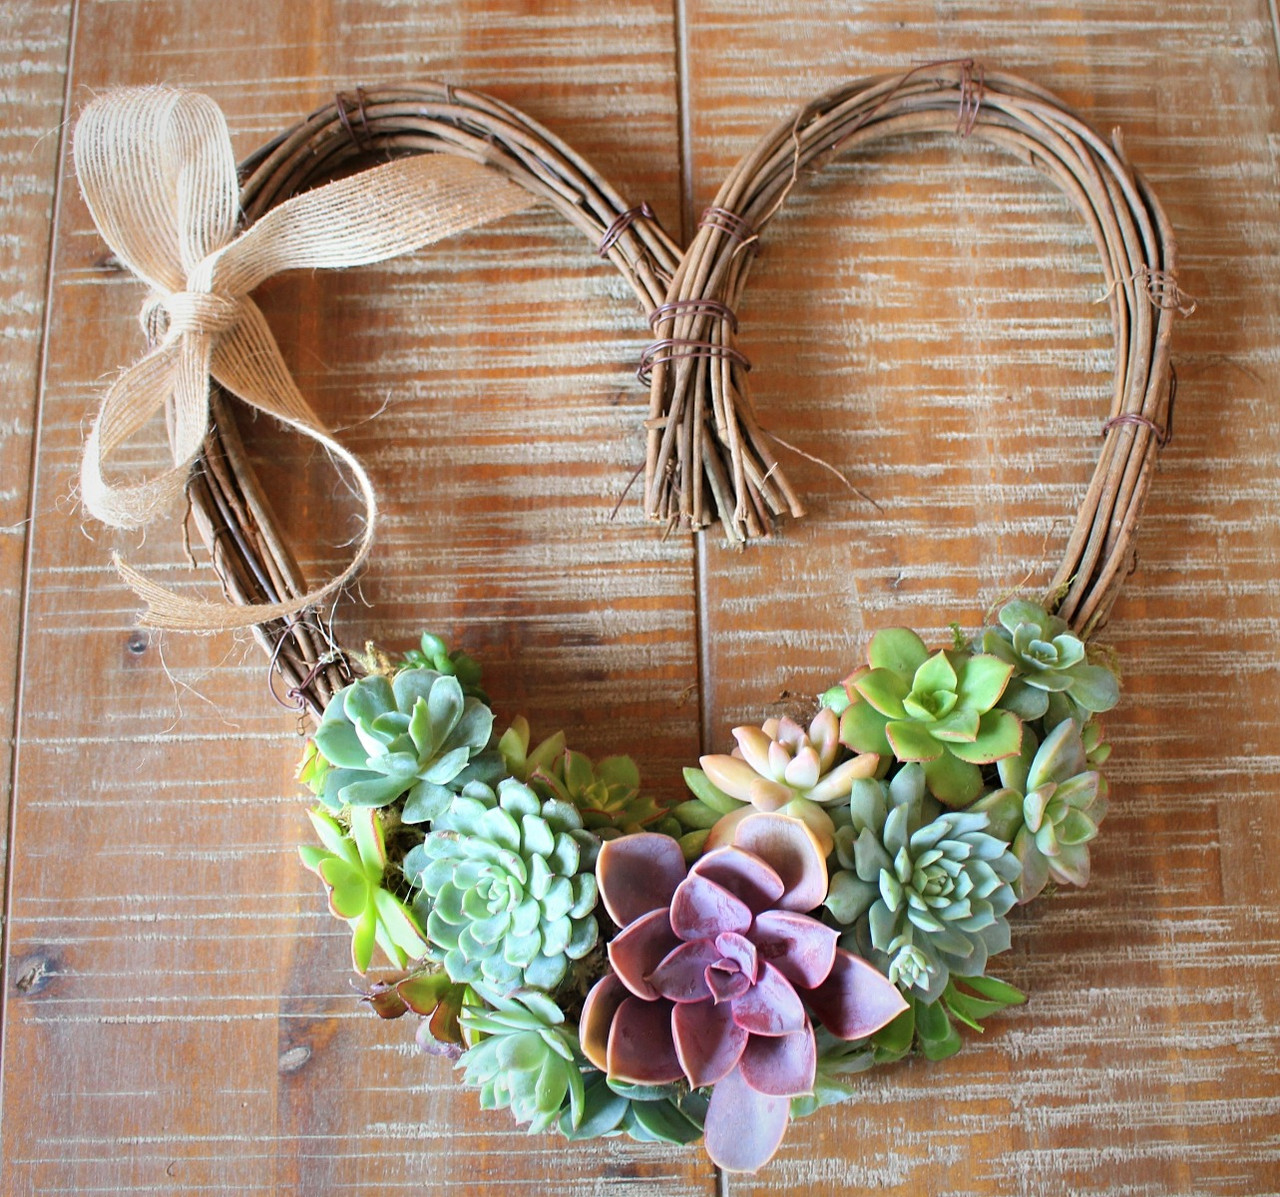 Succulent Arrangement Live Succulents Heart Wreath Holiday Gift Thank You Gift Bereavement Gift